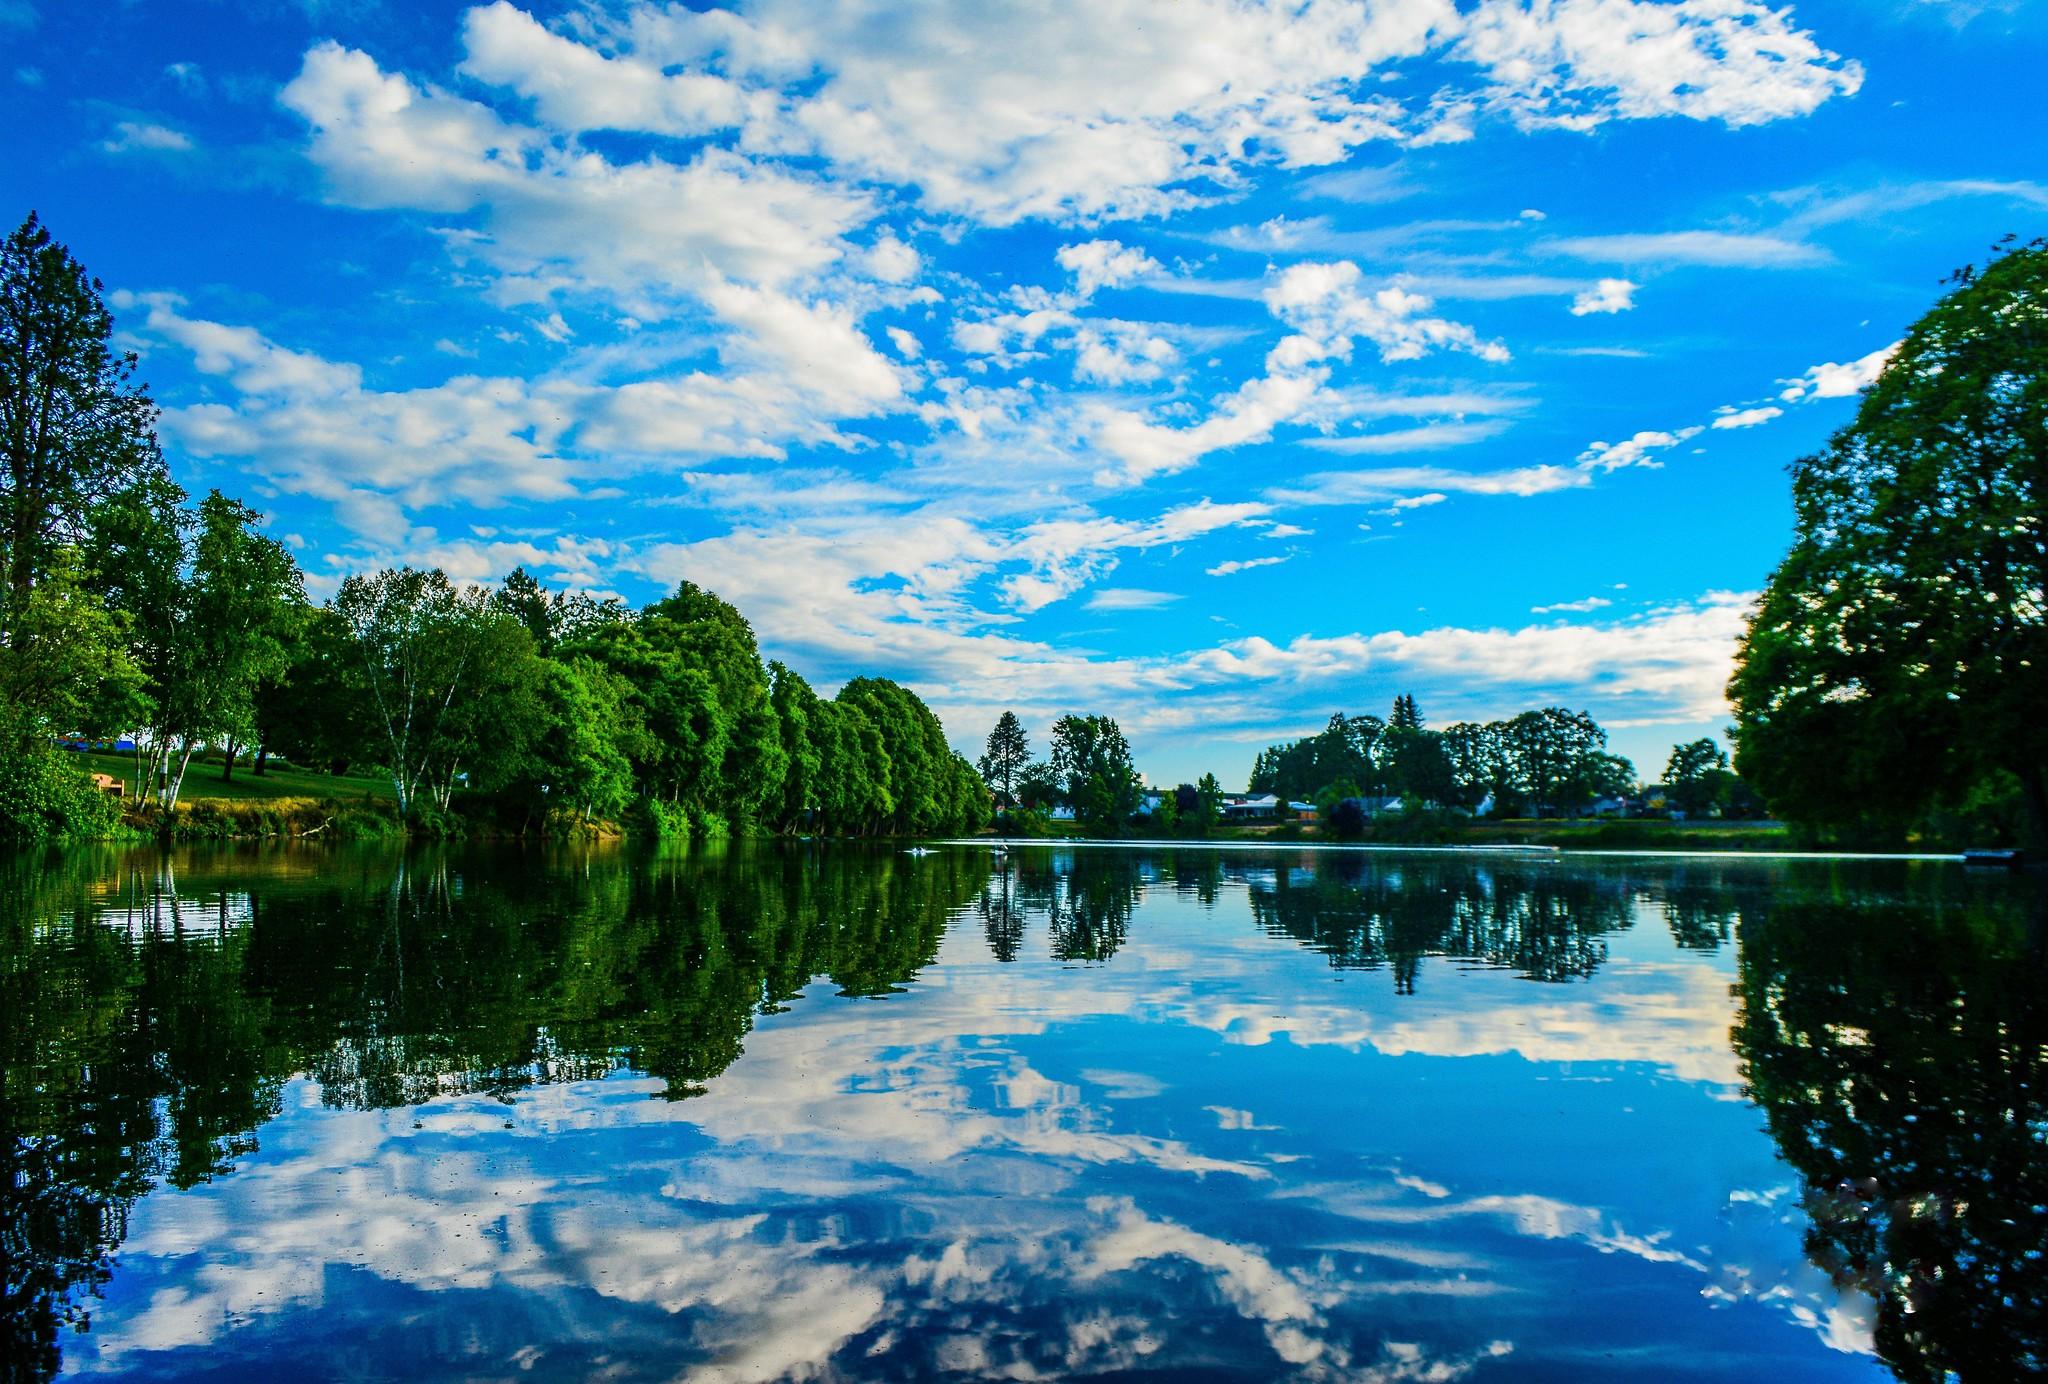 Image of Waverly Lake in Albany Oregon taken by AVA 2019 Photo Contest Winner Grand Champion David Maestes